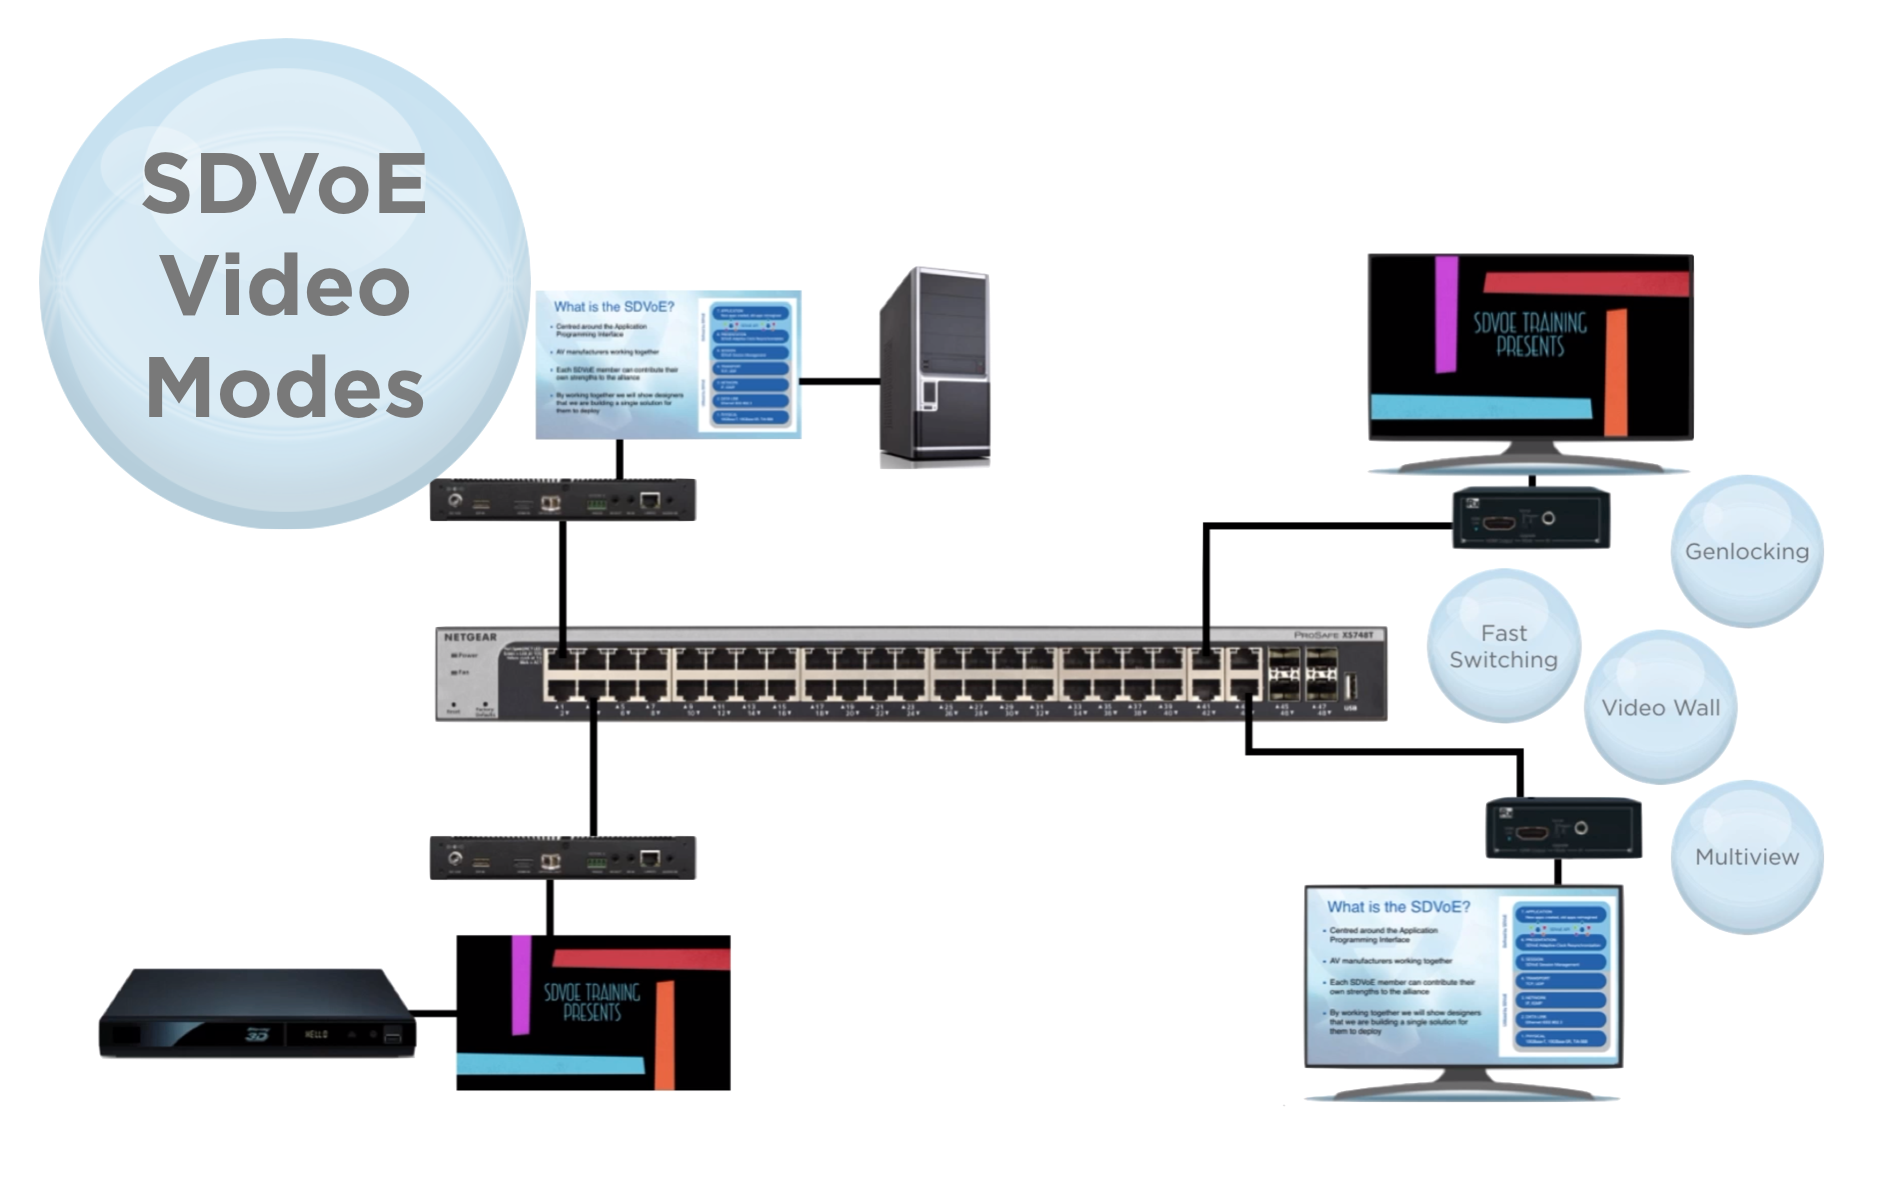 SDVoE Video Modes